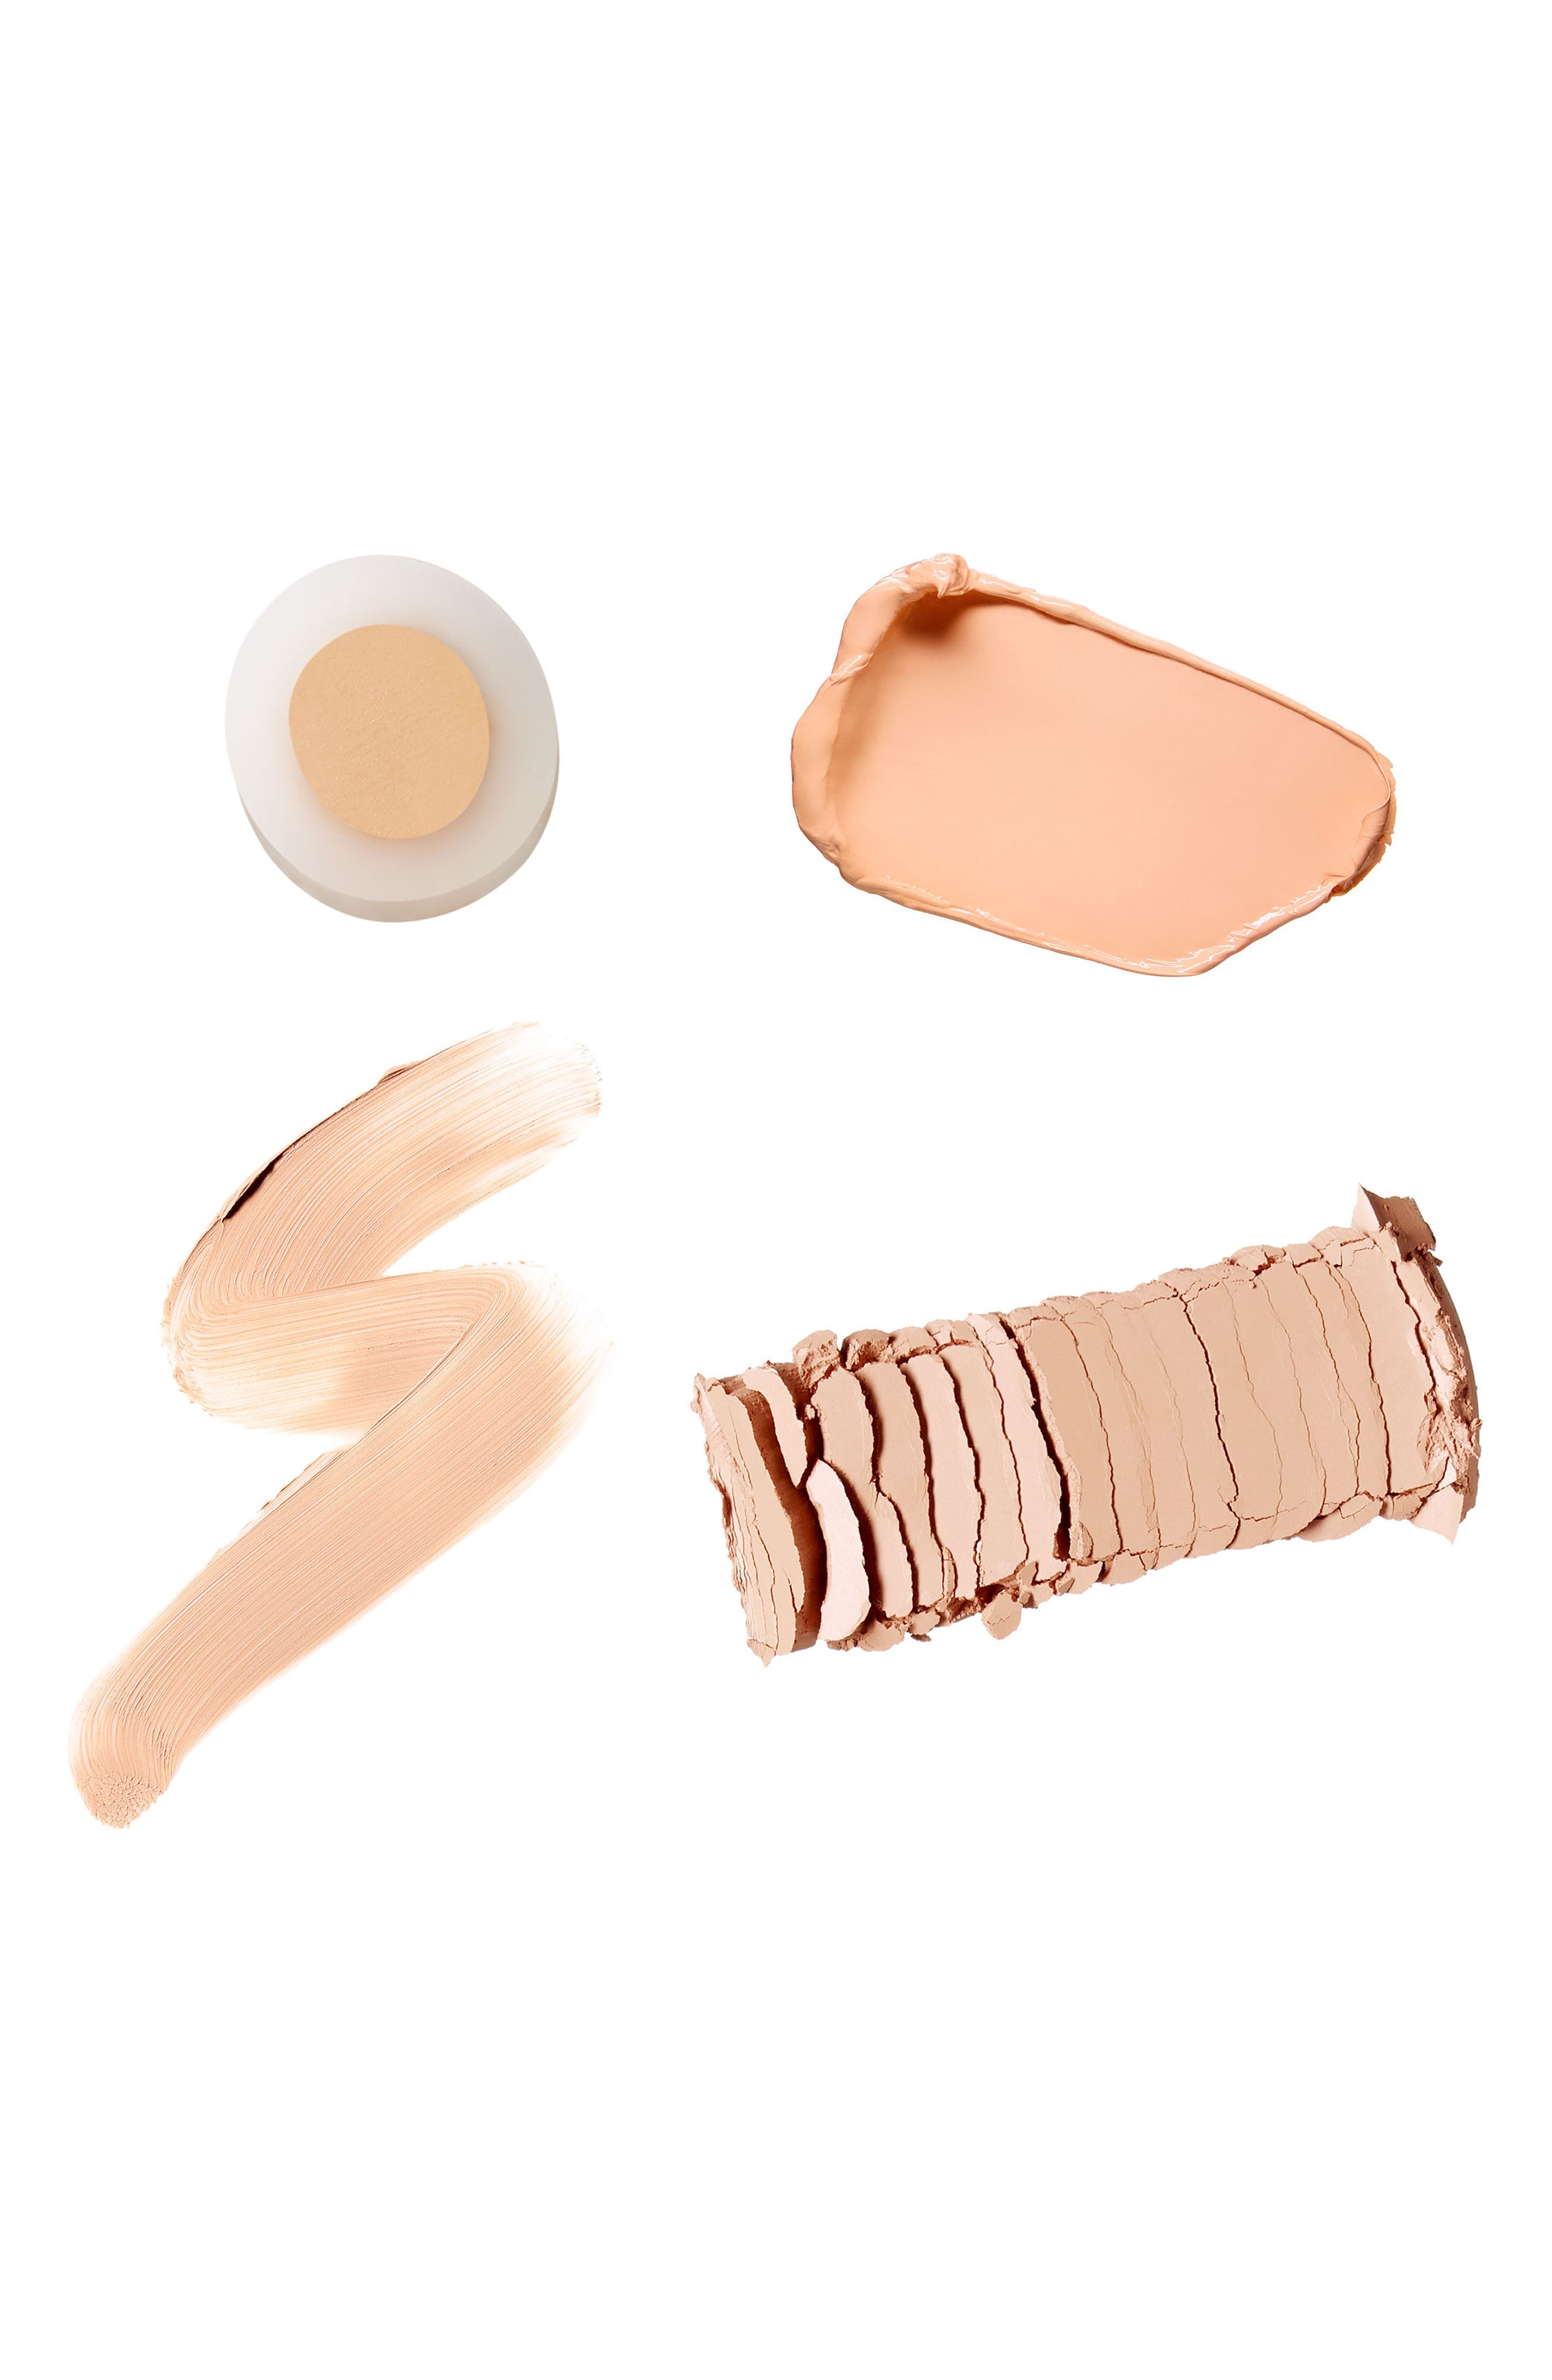 BENEFIT COSMETICS,                             Benefit Erase Case Boi-ing Concealer Kit,                             Alternate thumbnail 2, color,                             LIGHT